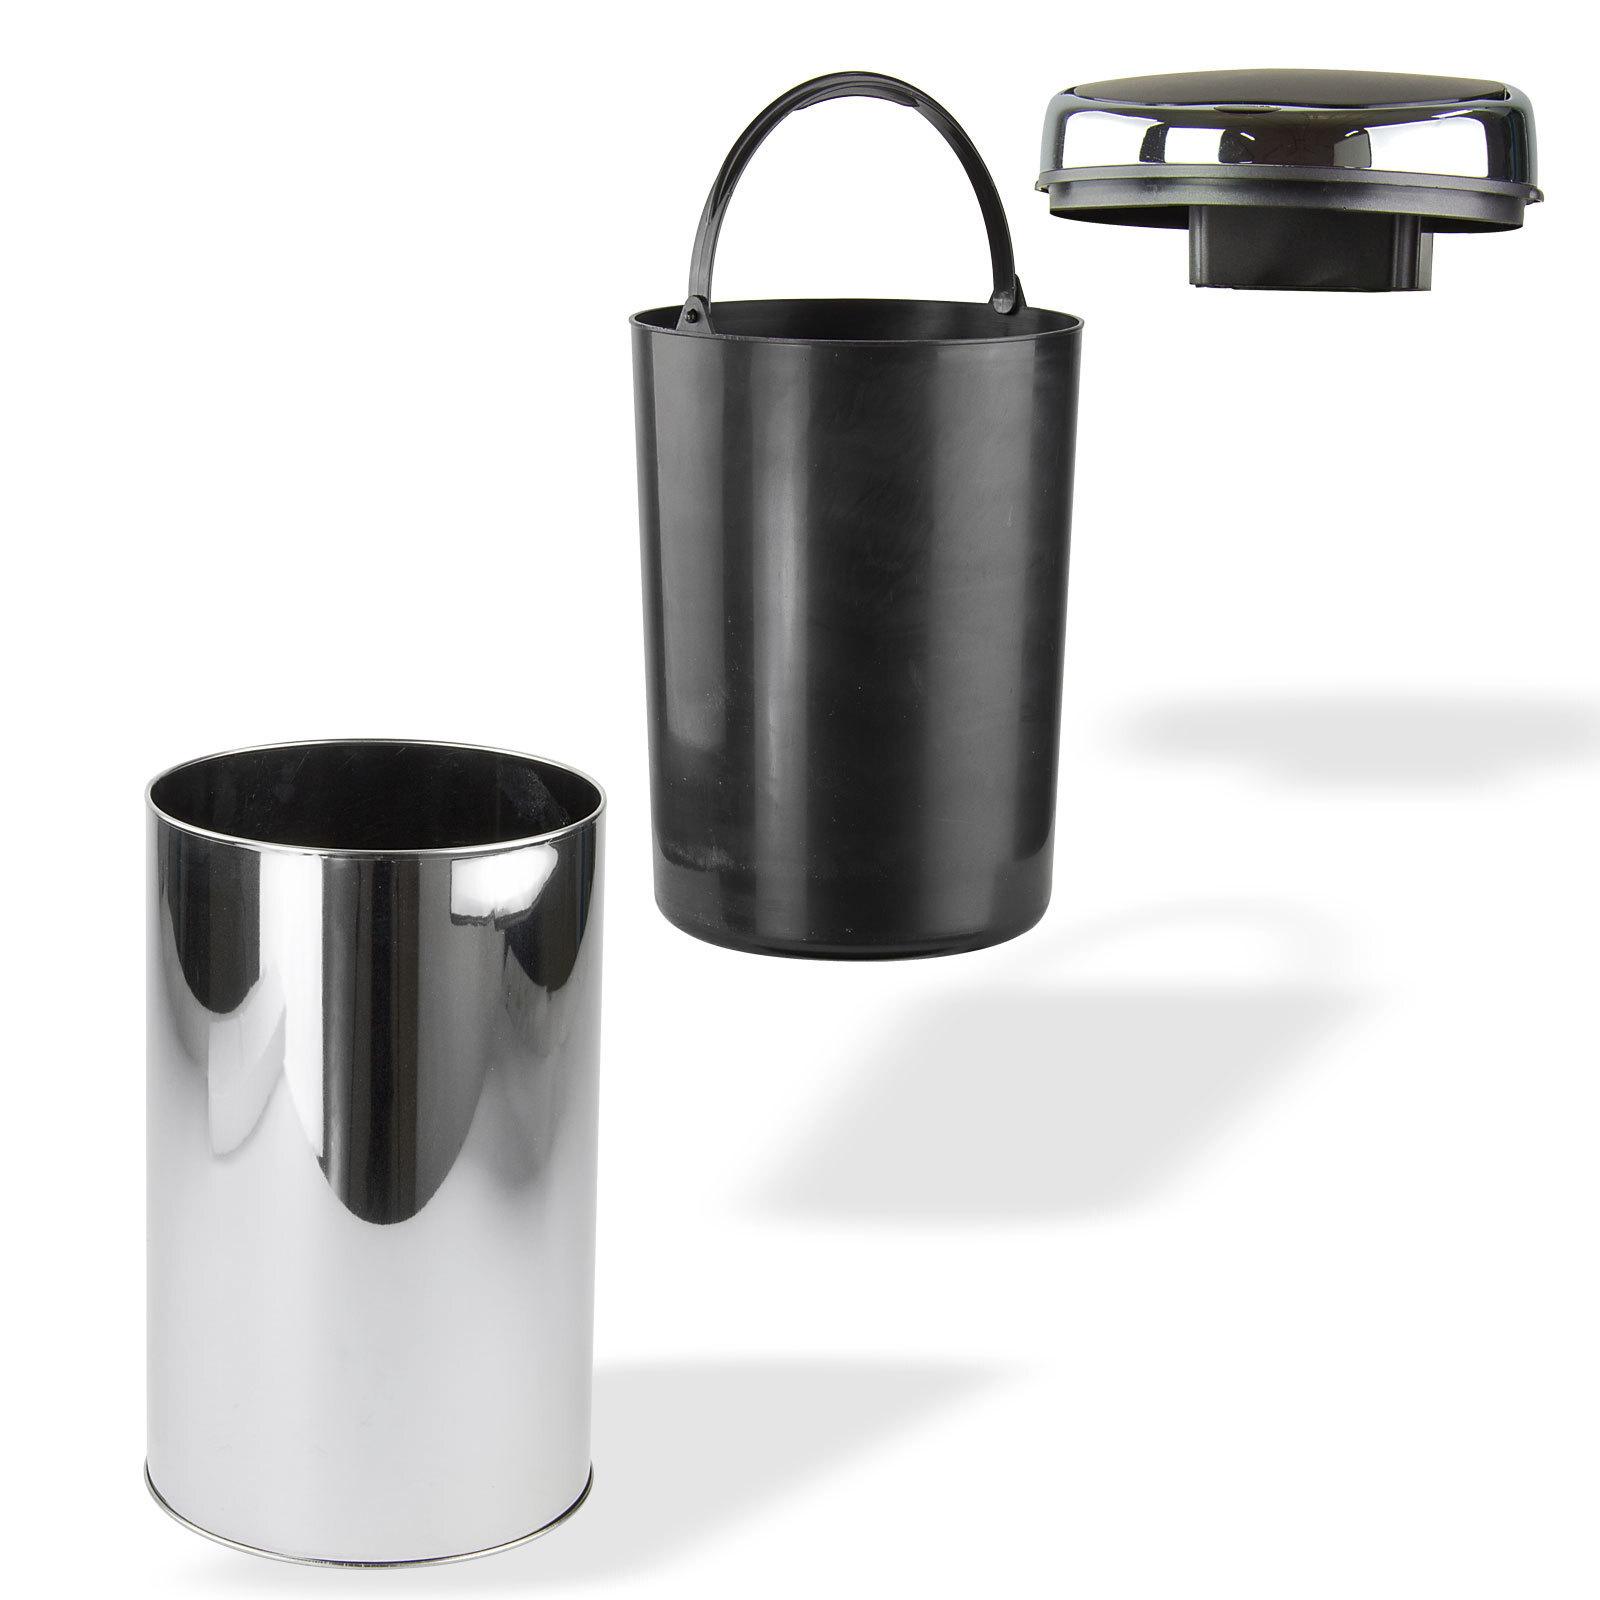 automatik m lleimer abfalleimer mit sensor 6 liter silber. Black Bedroom Furniture Sets. Home Design Ideas